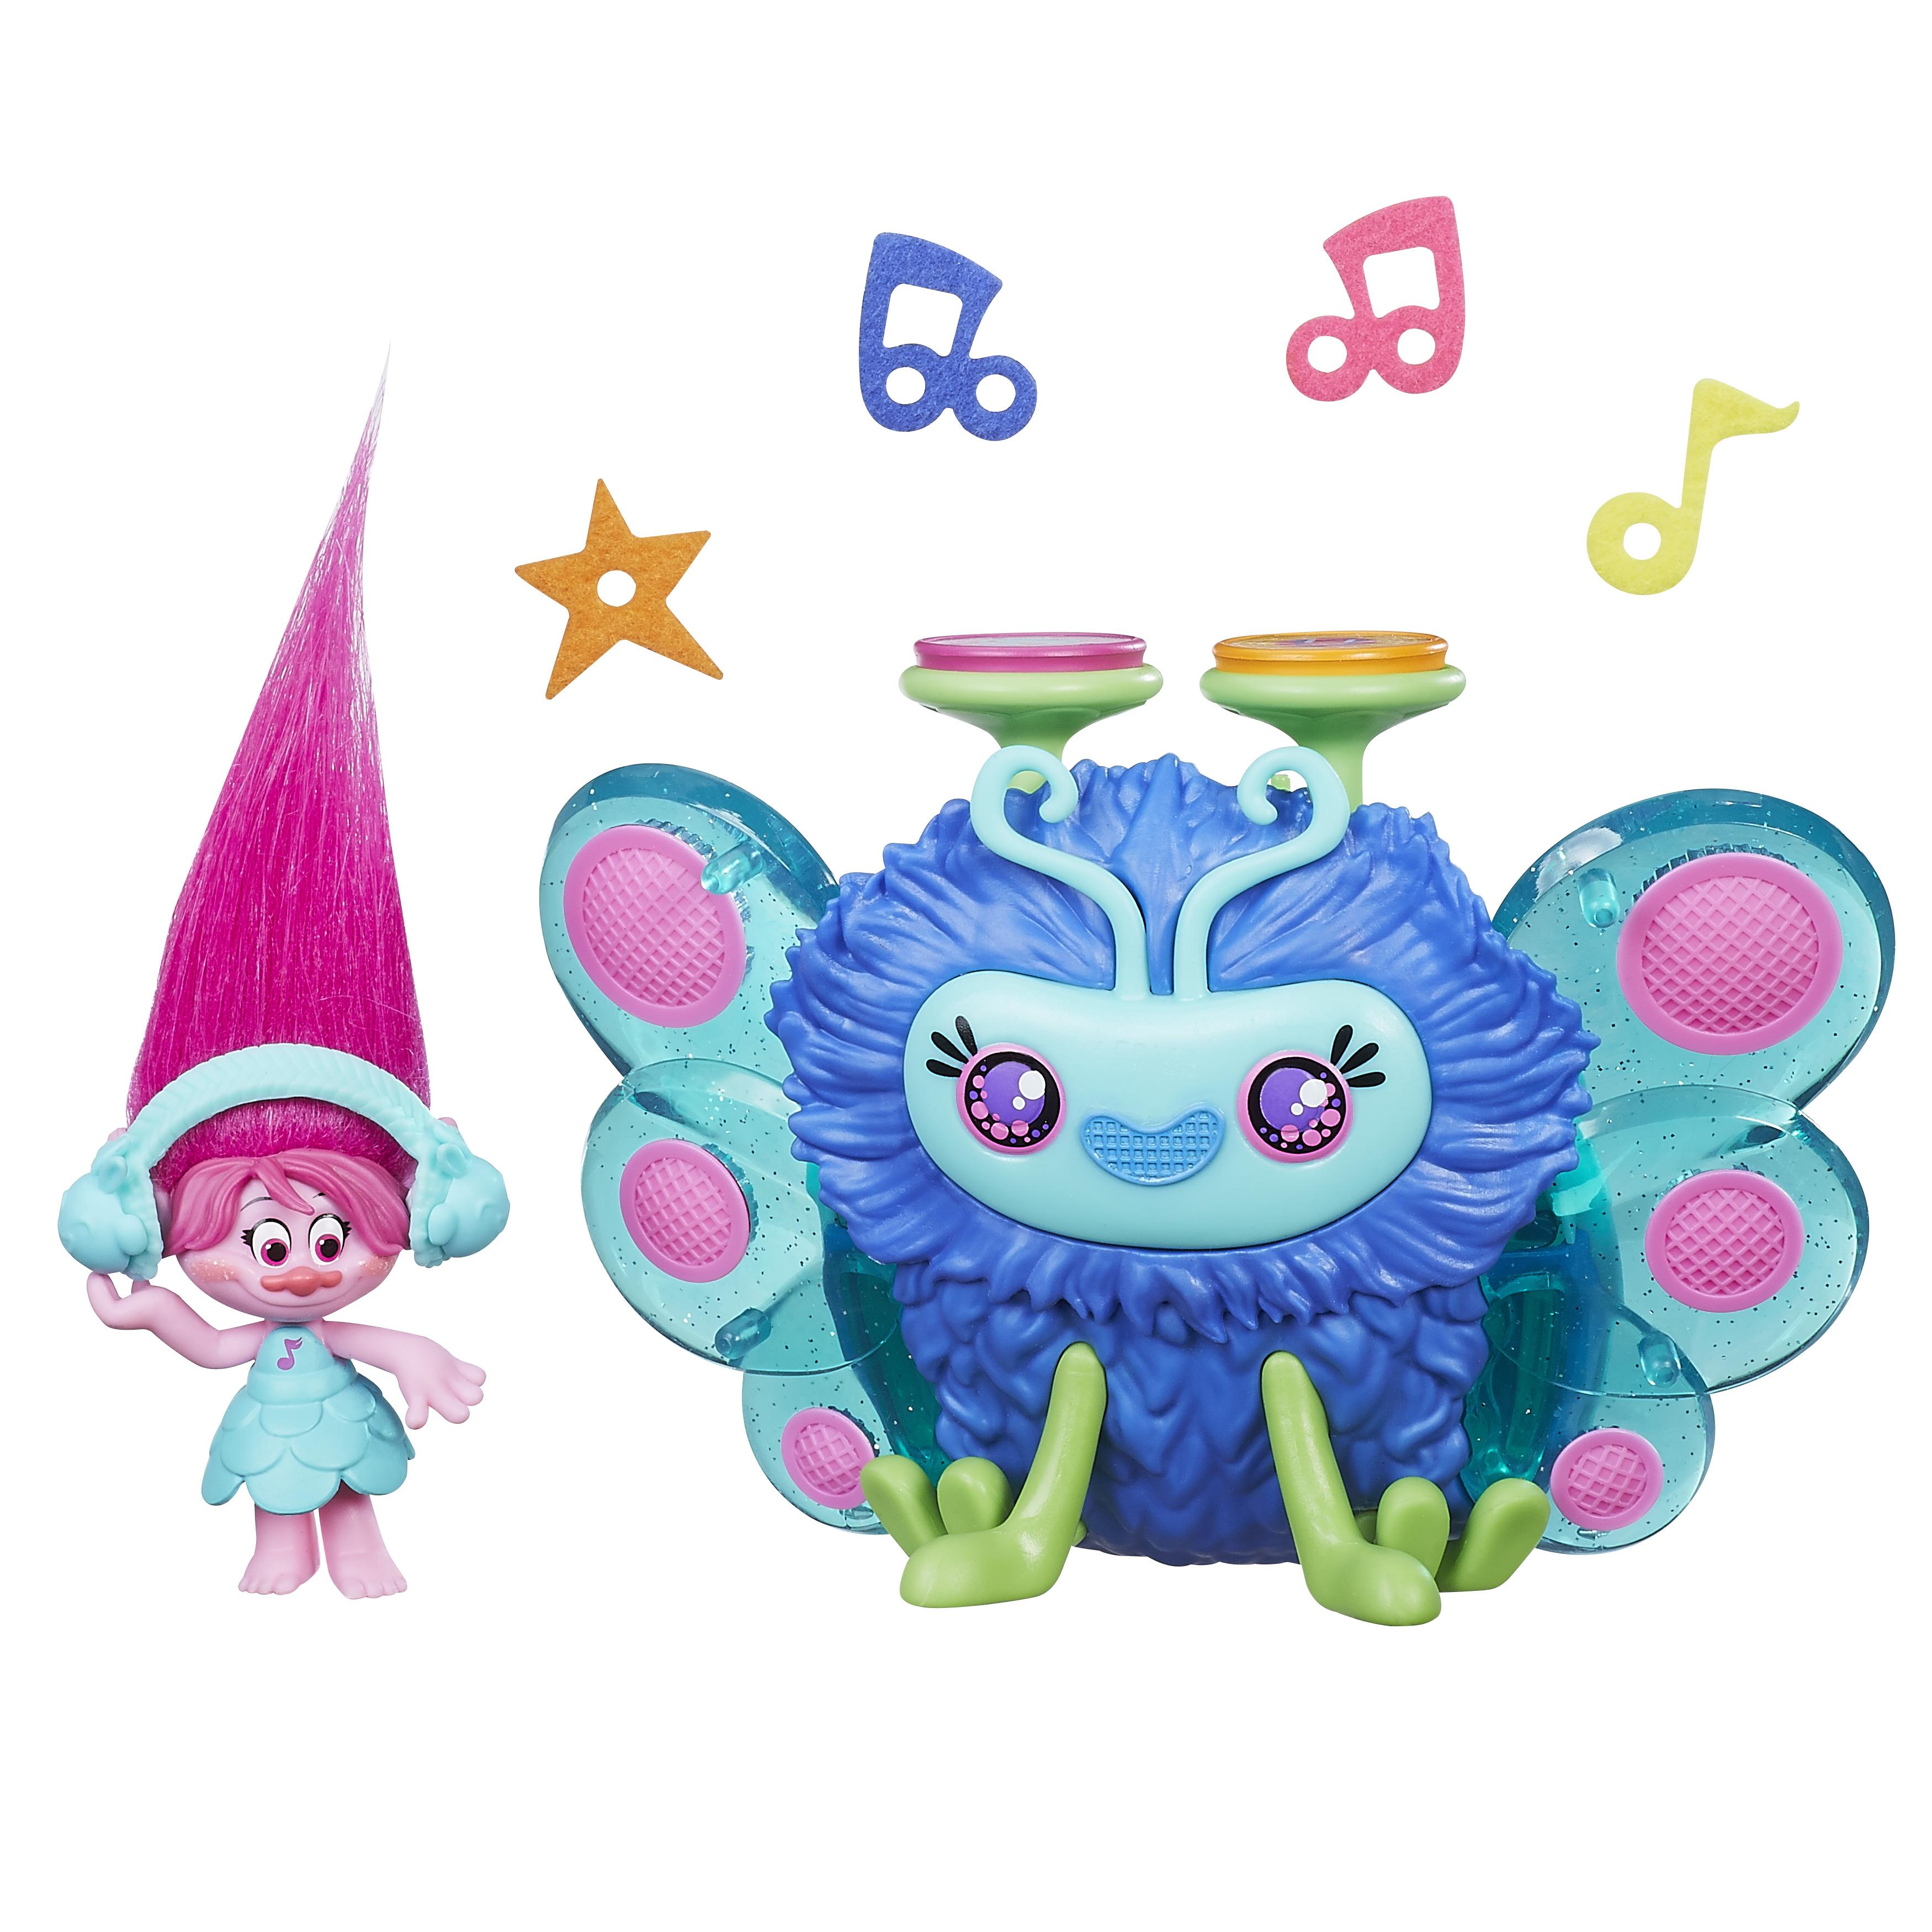 Trolls Город троллей Диджей Баг 6pcs set 8cm trolls movie figure collectible dolls poppy branch biggie pvc trolls action figures toy for kids christmas gifts